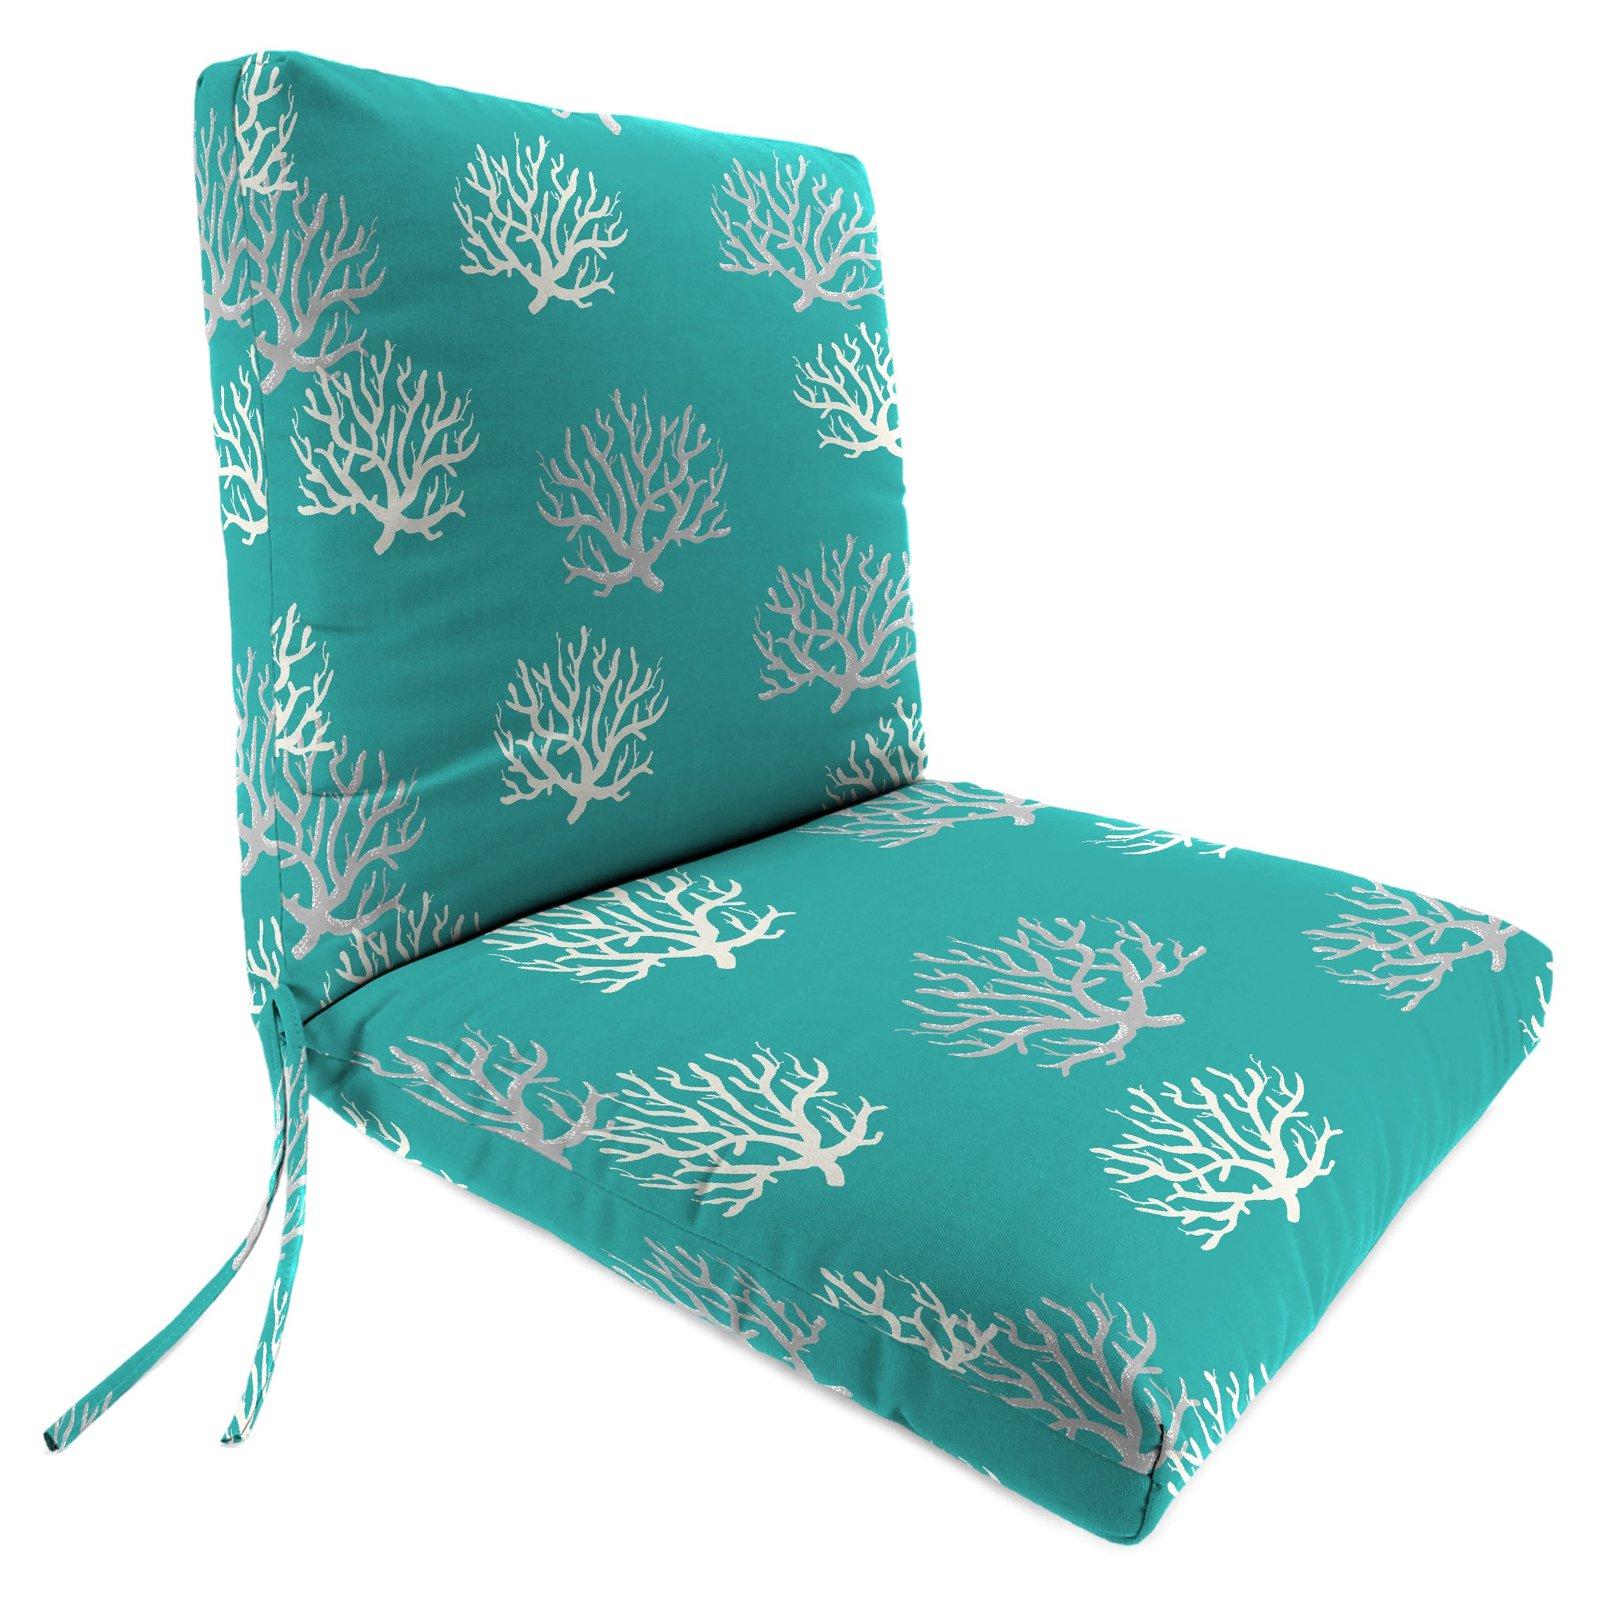 Jordan Manufacturing 40 In Hinged Outdoor Chair Cushion Isadella Ocean Jordan Manufacturing Outdoor Chair Cushions Chair Cushions